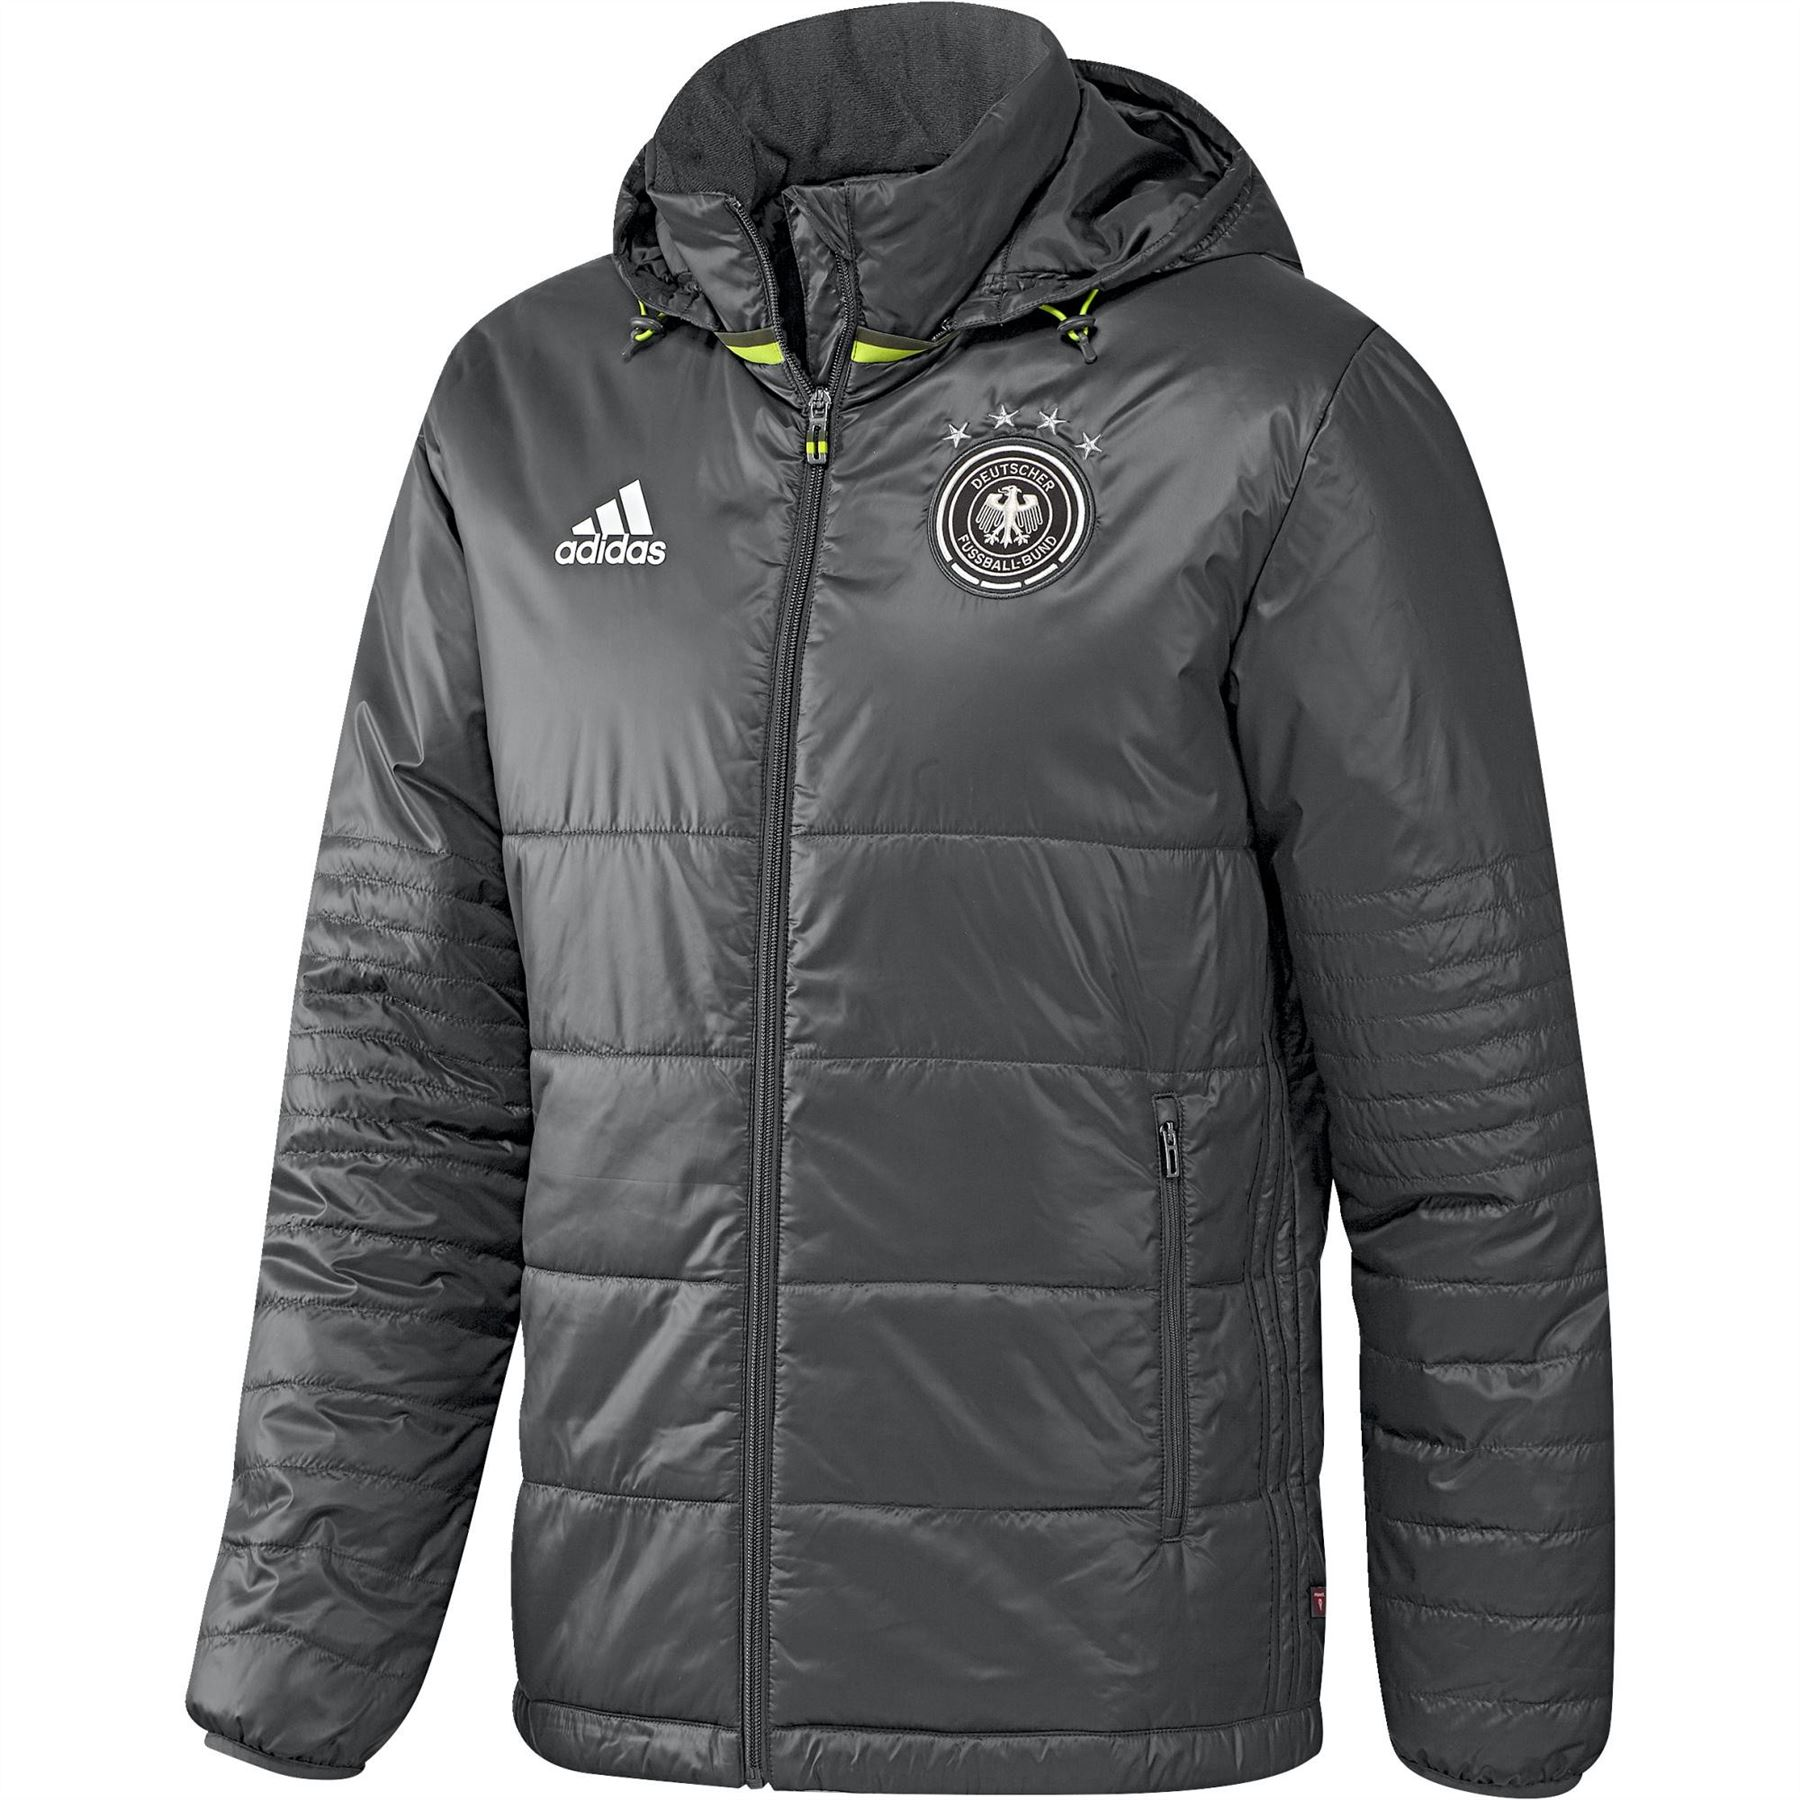 adidas chaqueta gris